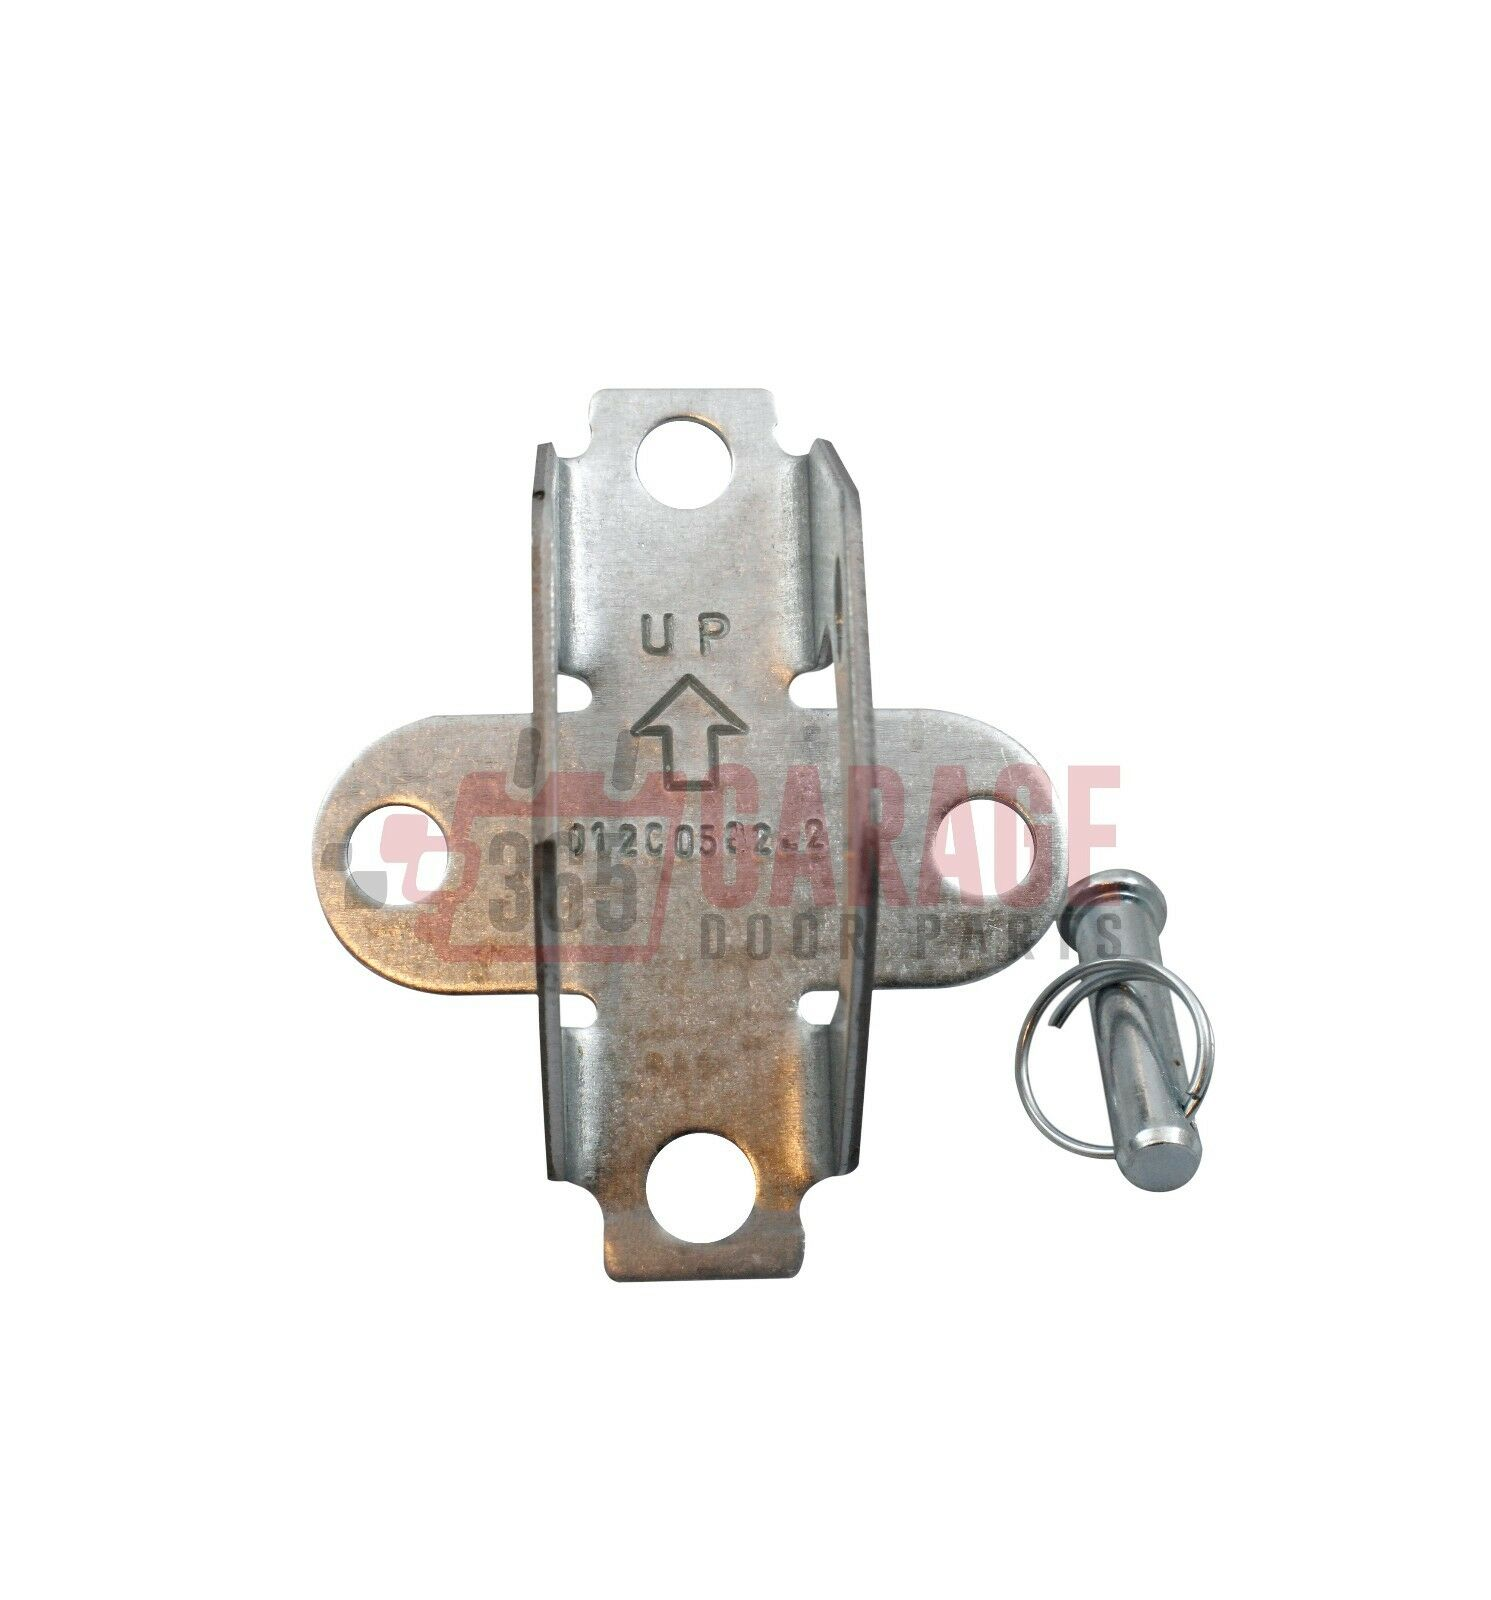 Liftmaster 41A5047 Chamberlain Craftsman Door Bracket For